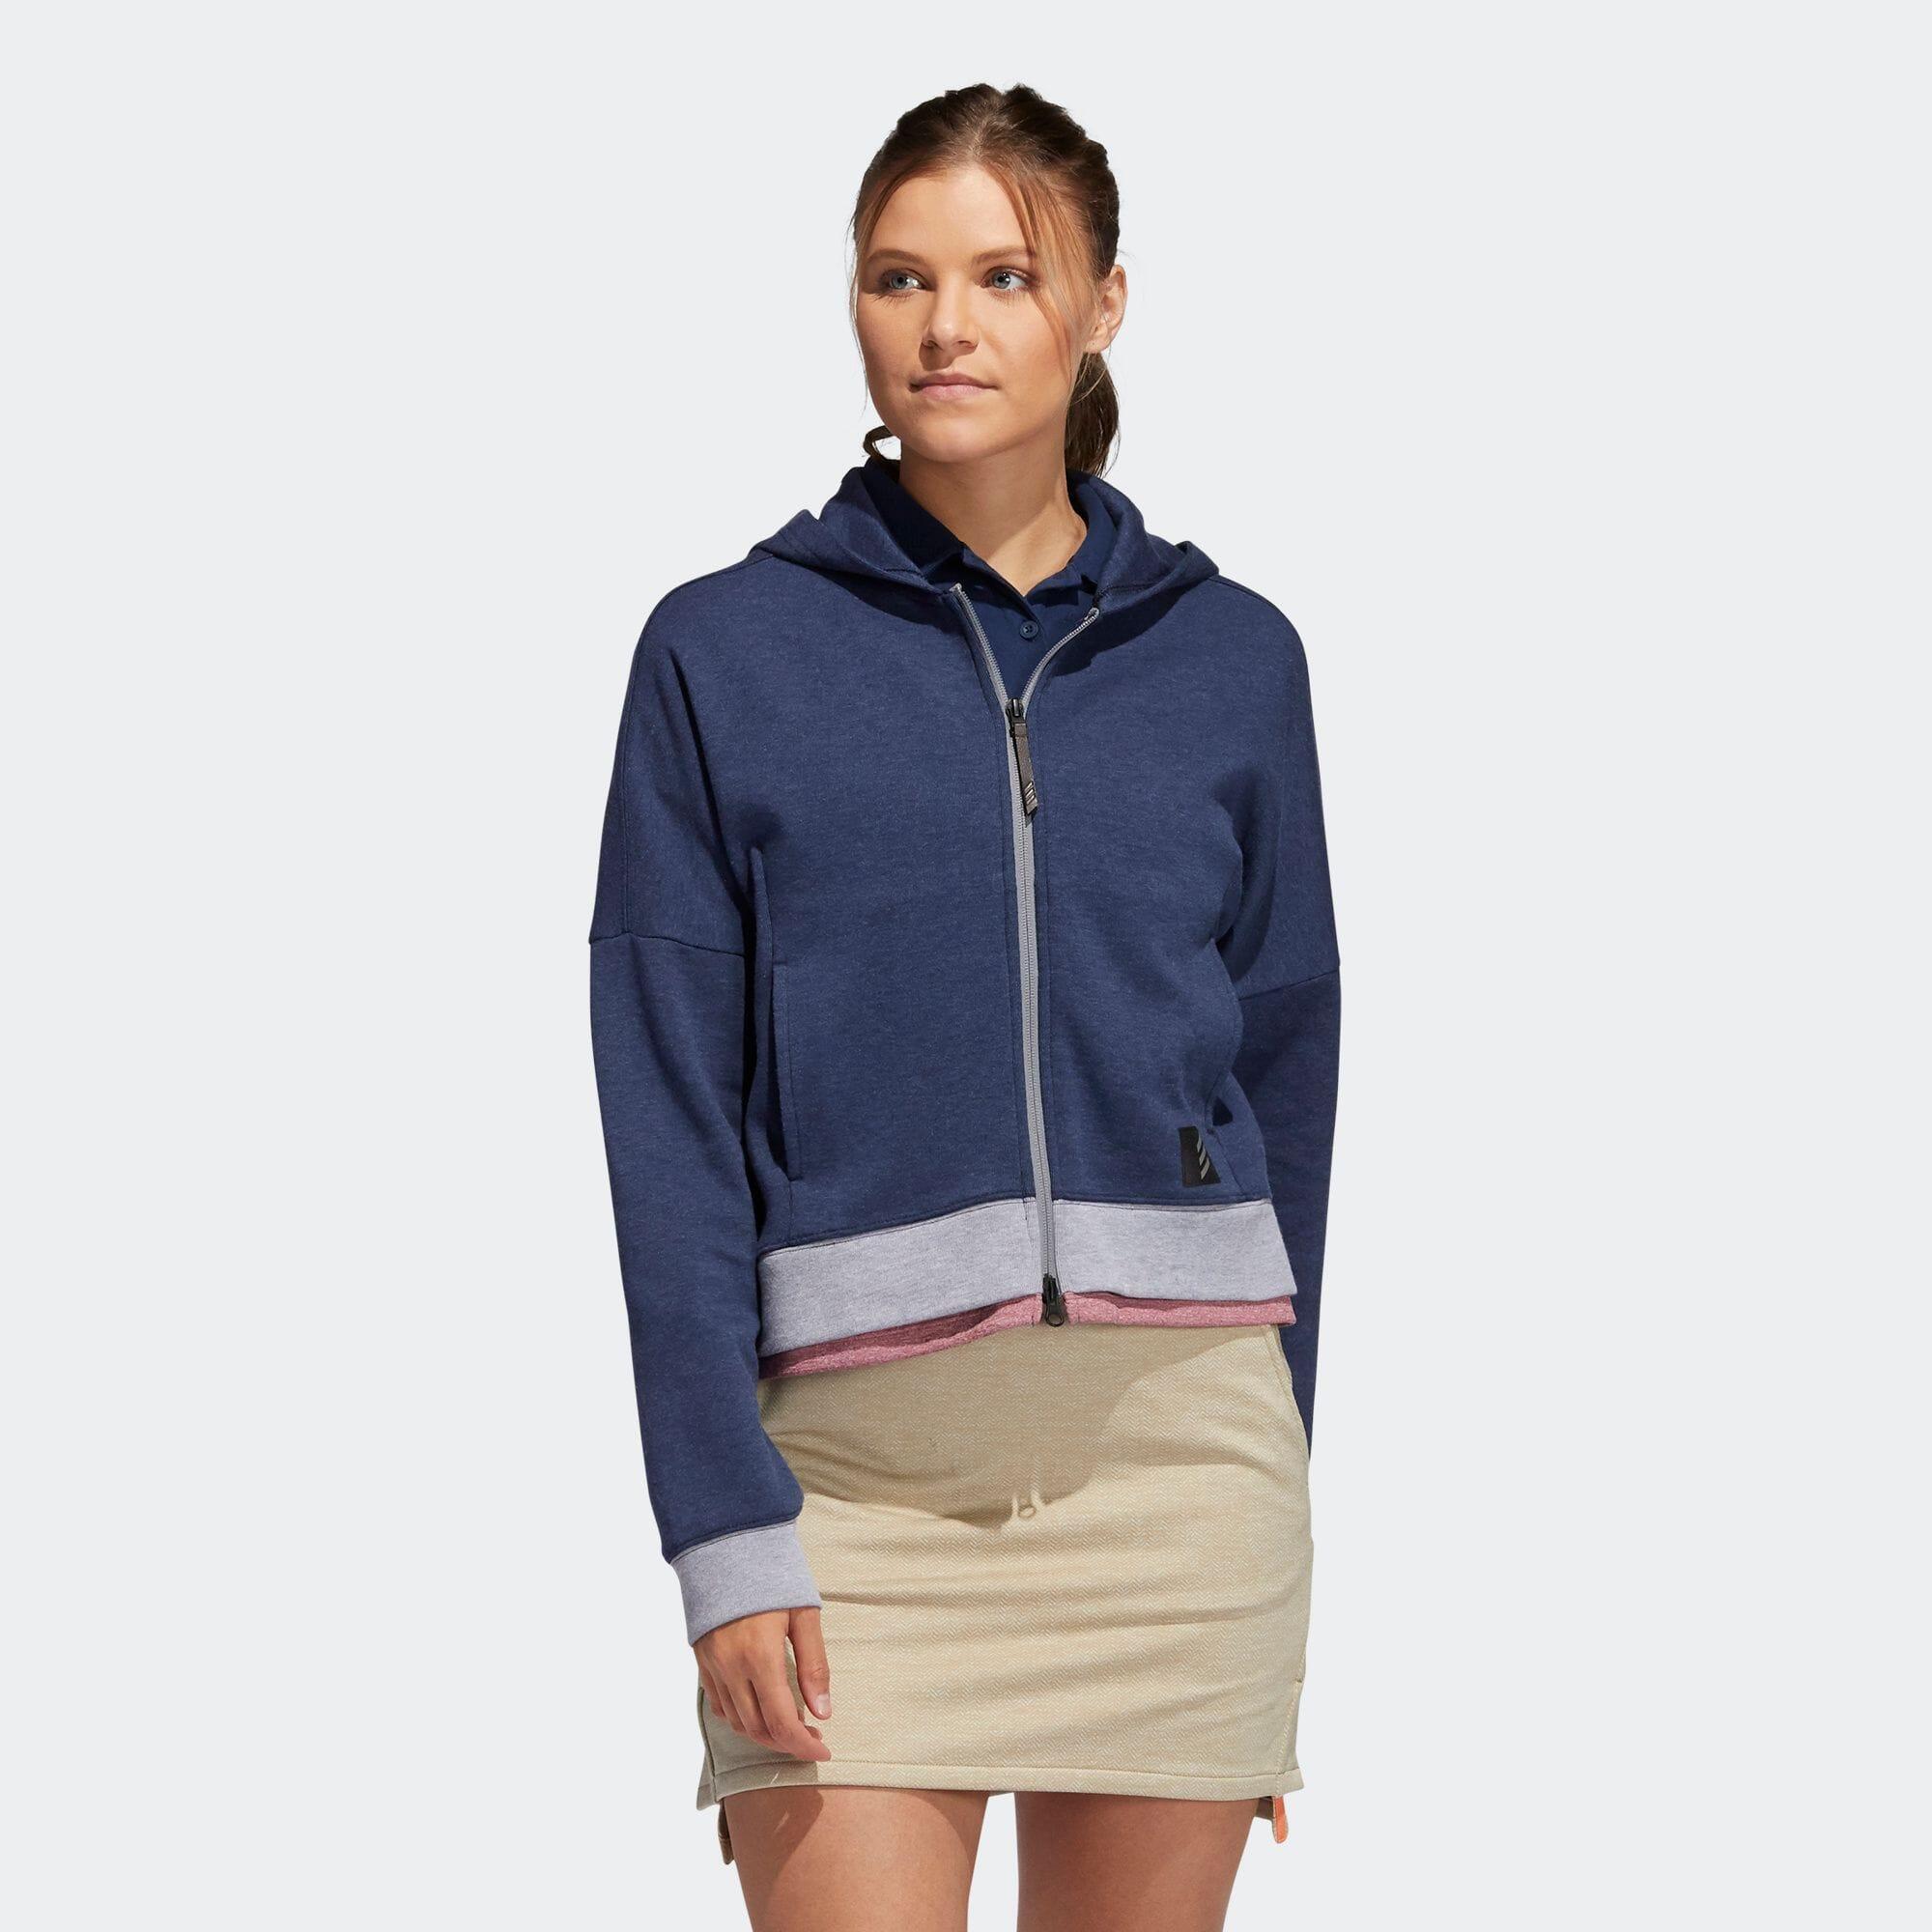 ADICROSS 長袖ショートレングス フルジップフーディー 【ゴルフ】/ Adicross Sweater Hoodie